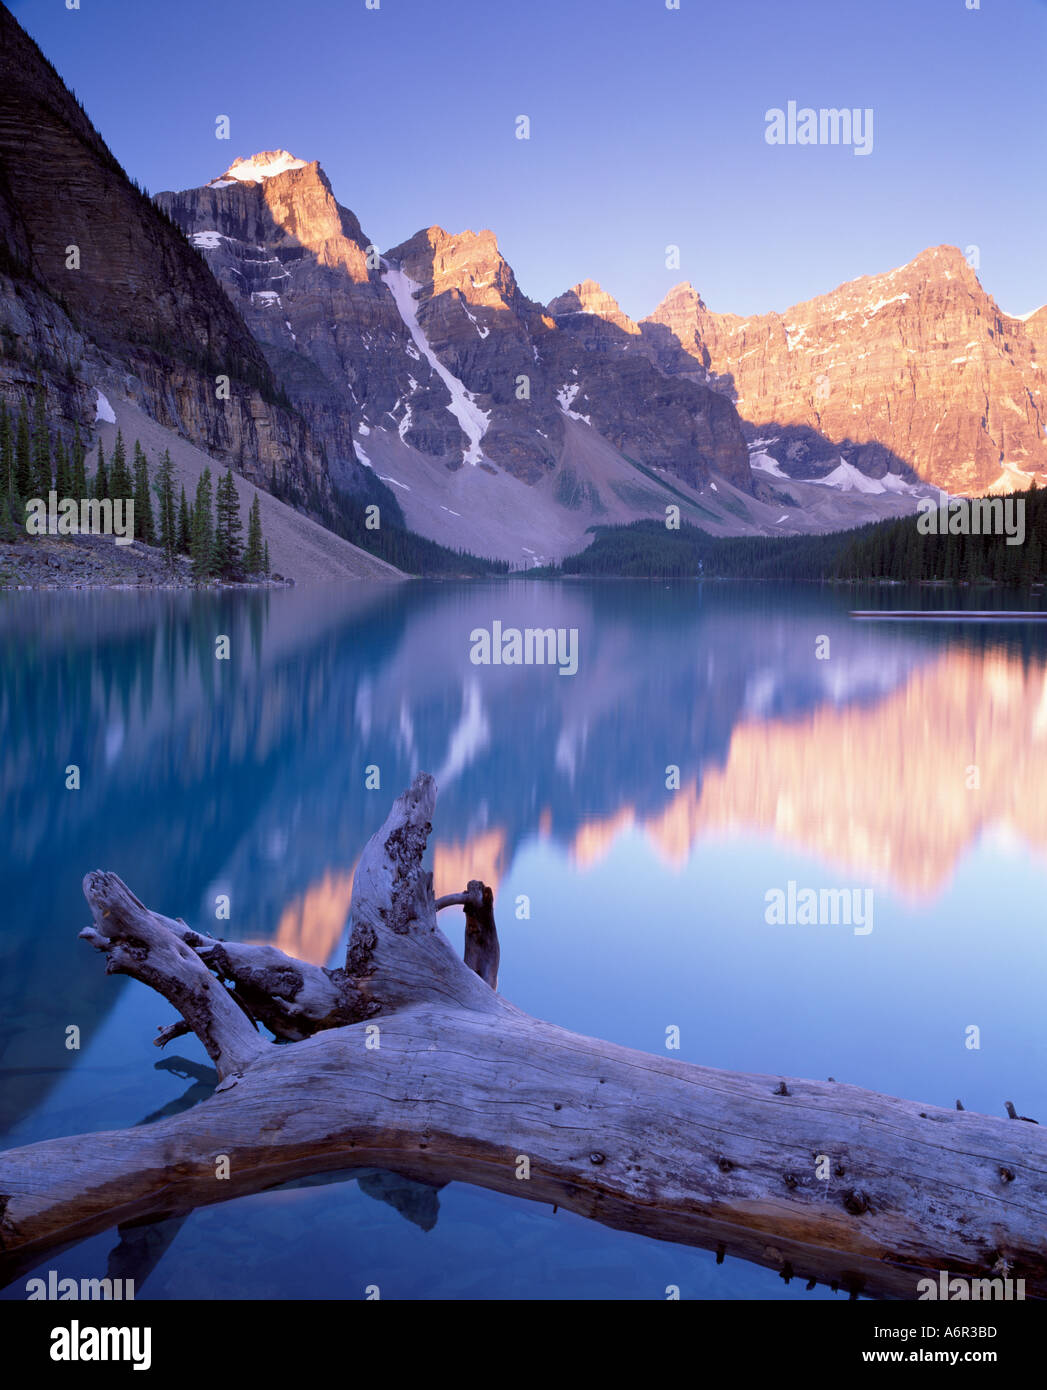 Moraine Lake Banff National Park Canadian Rockies - Stock Image